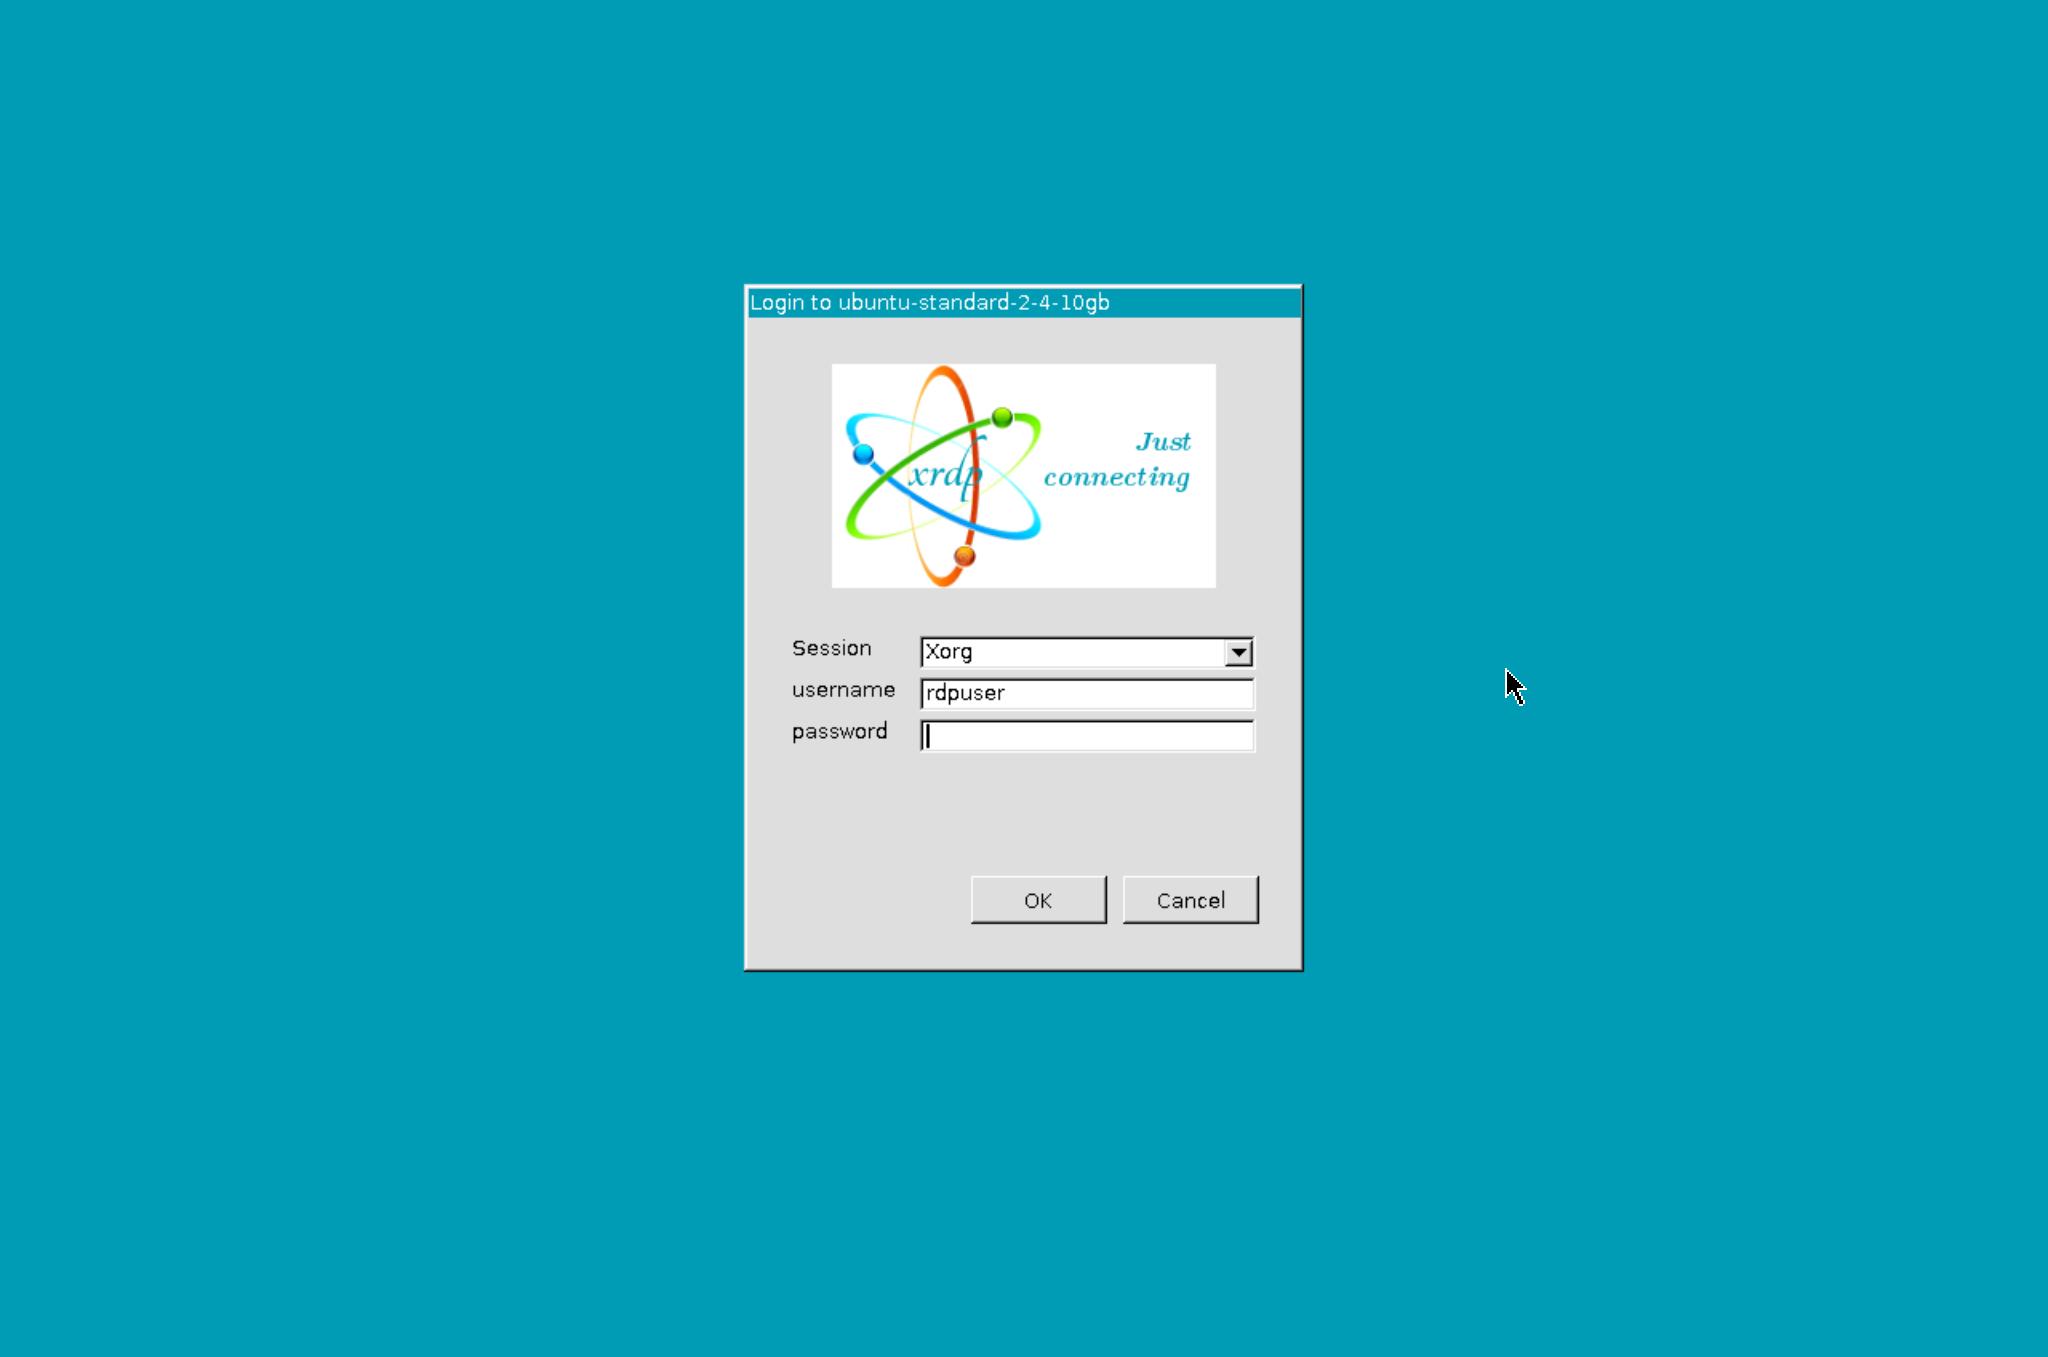 VPS на Linux с графическим интерфейсом: запускаем сервер RDP на Ubuntu 18.04 - 9